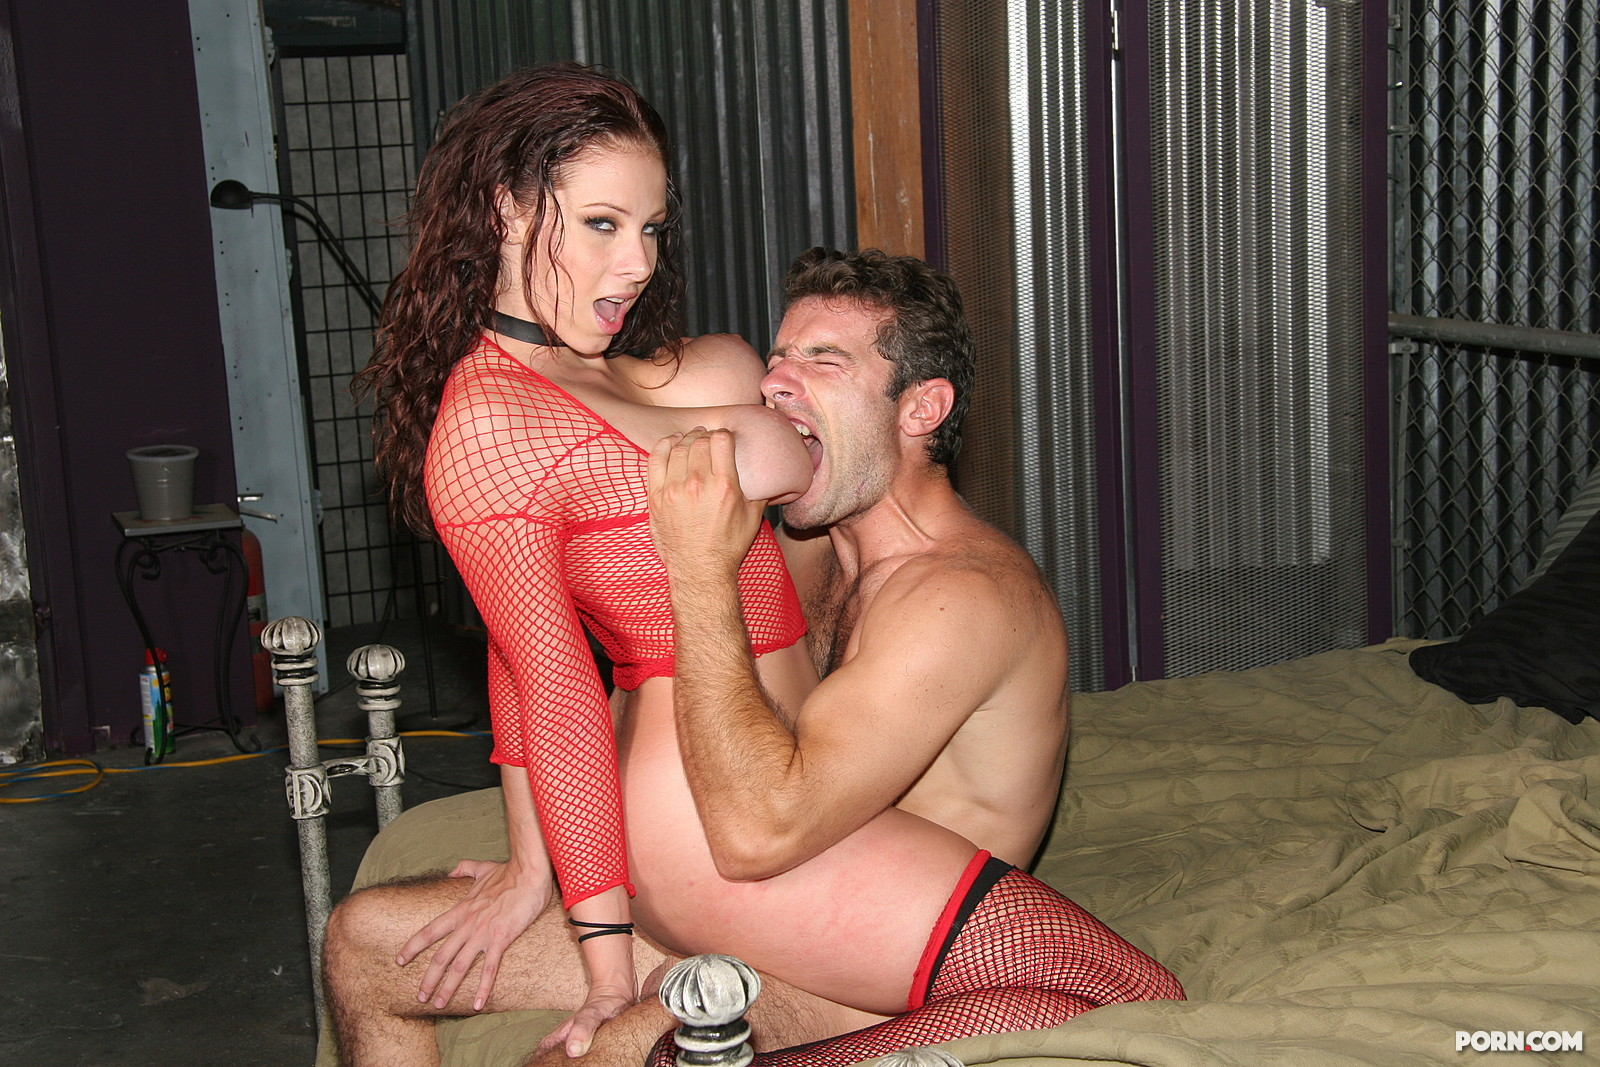 Хозяин и рабыня онлайн порно 27 фотография